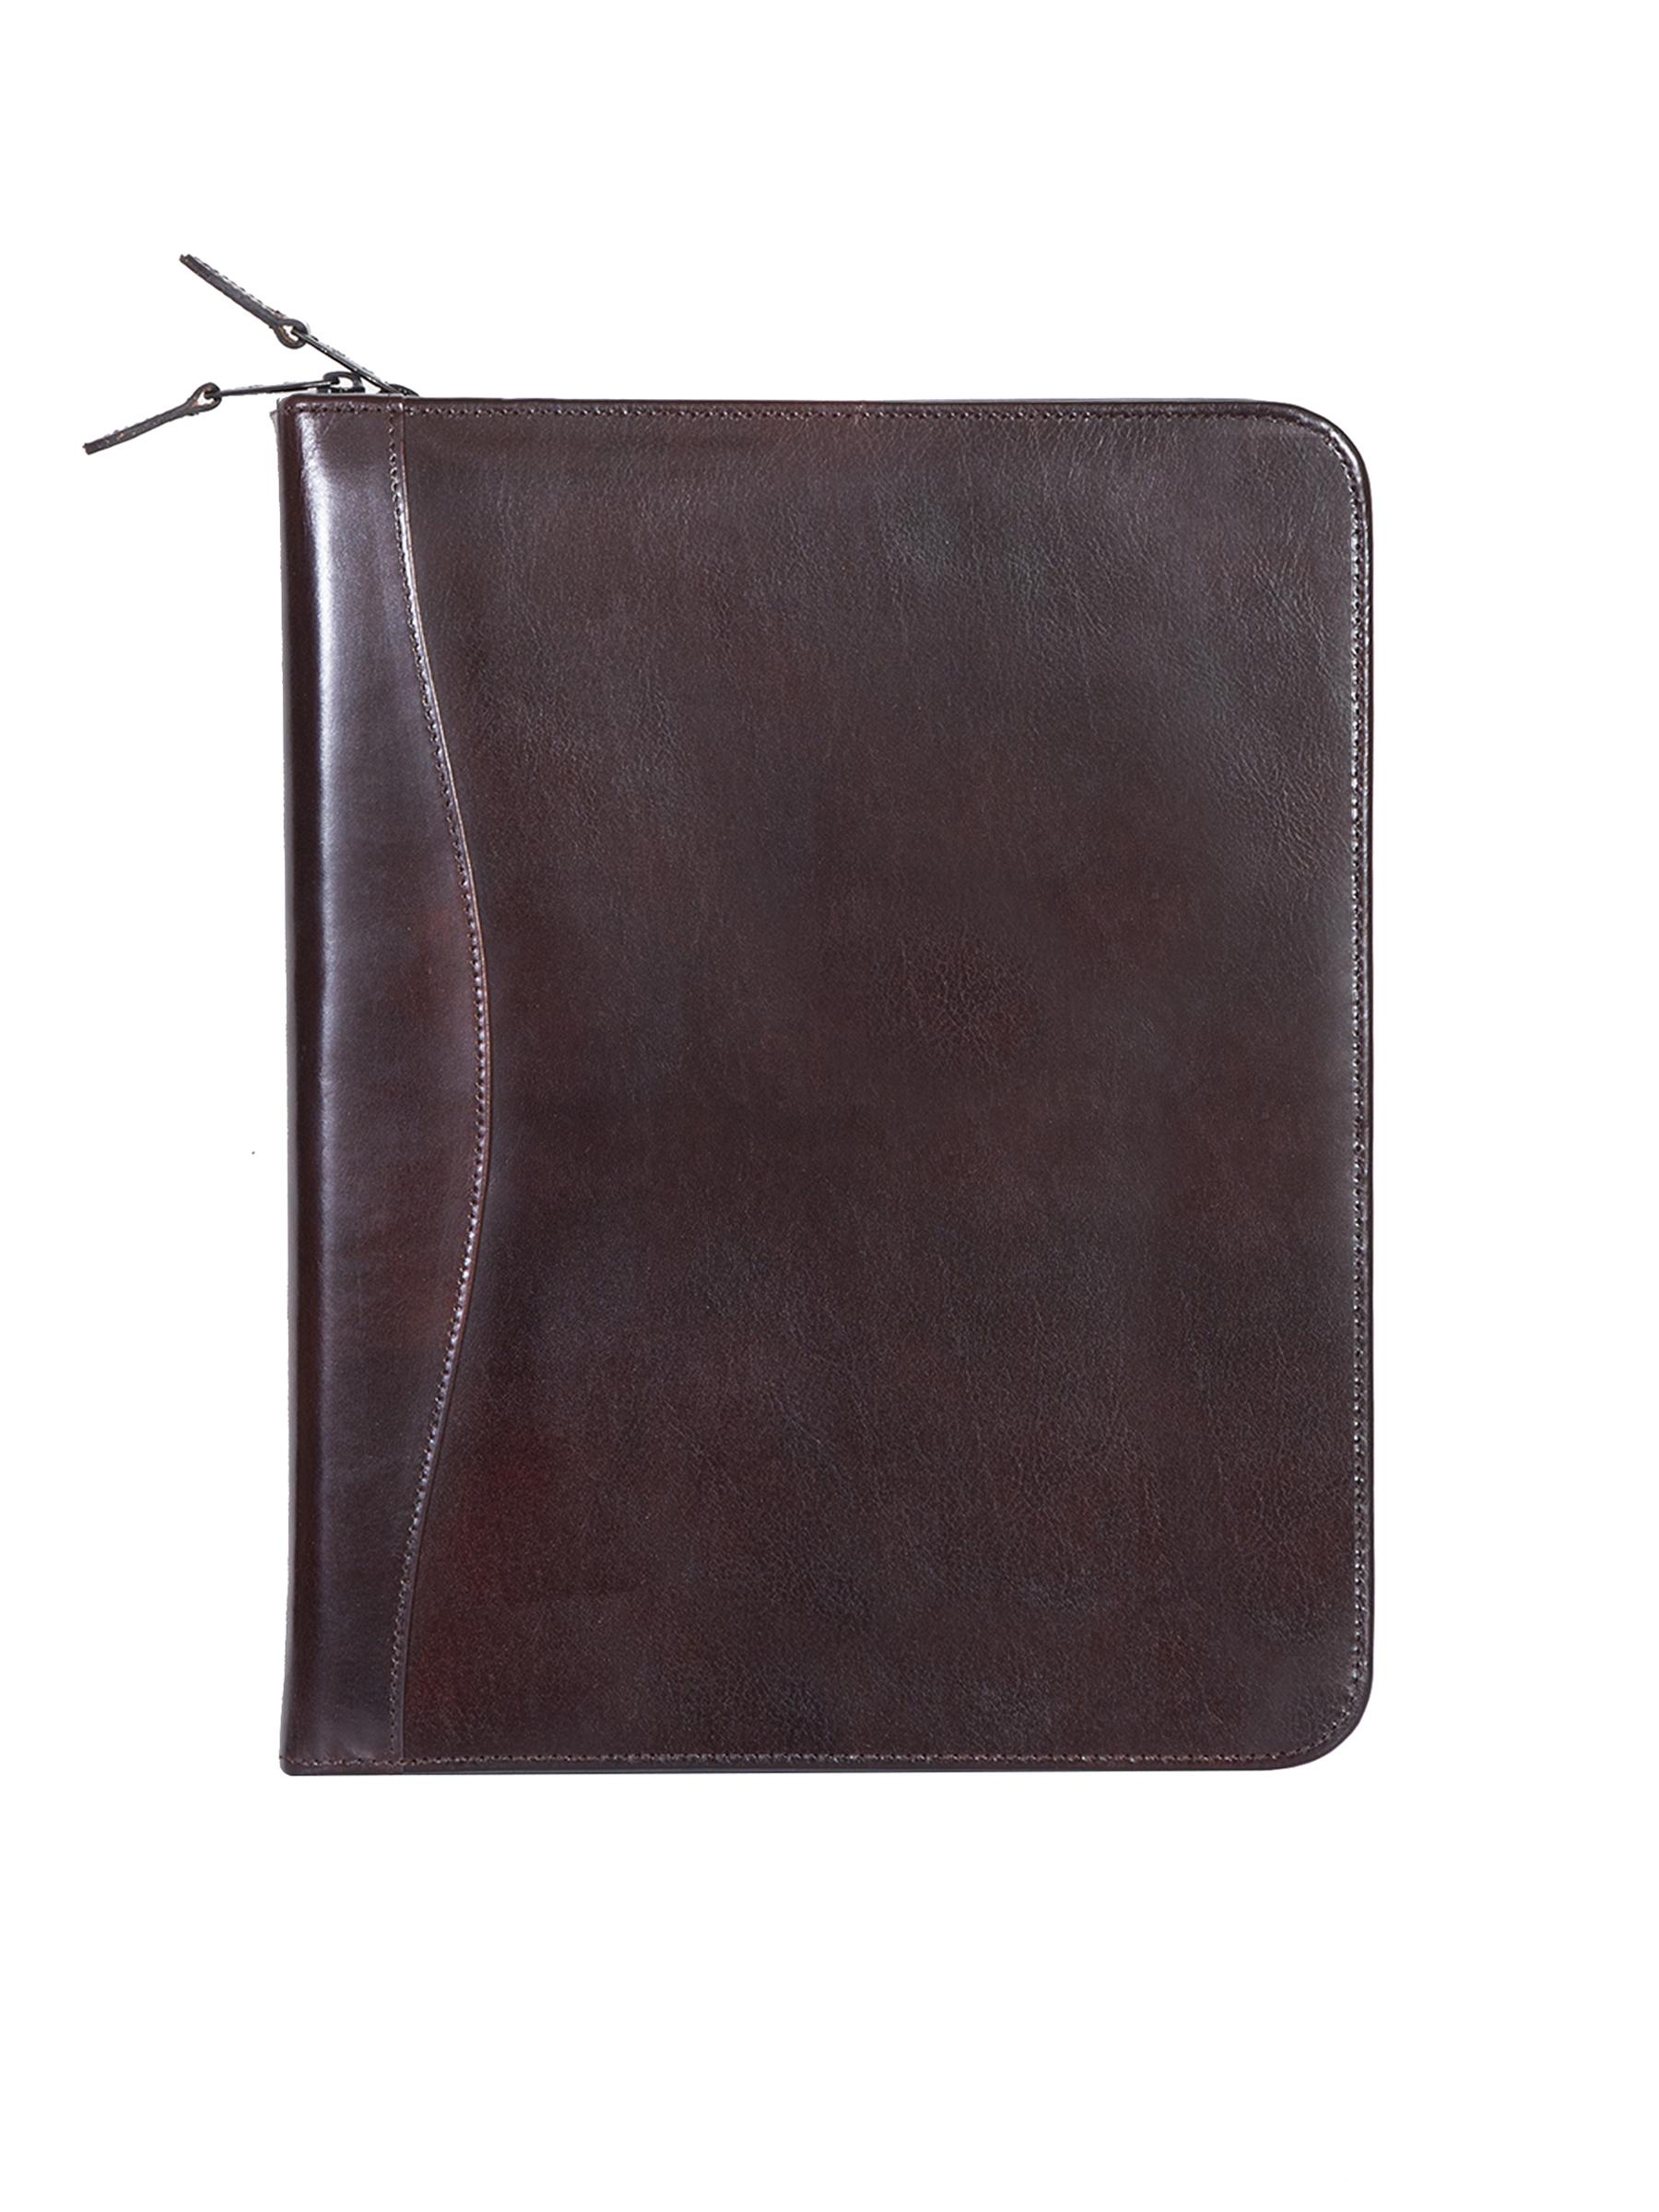 Leather 3 ring zip binder